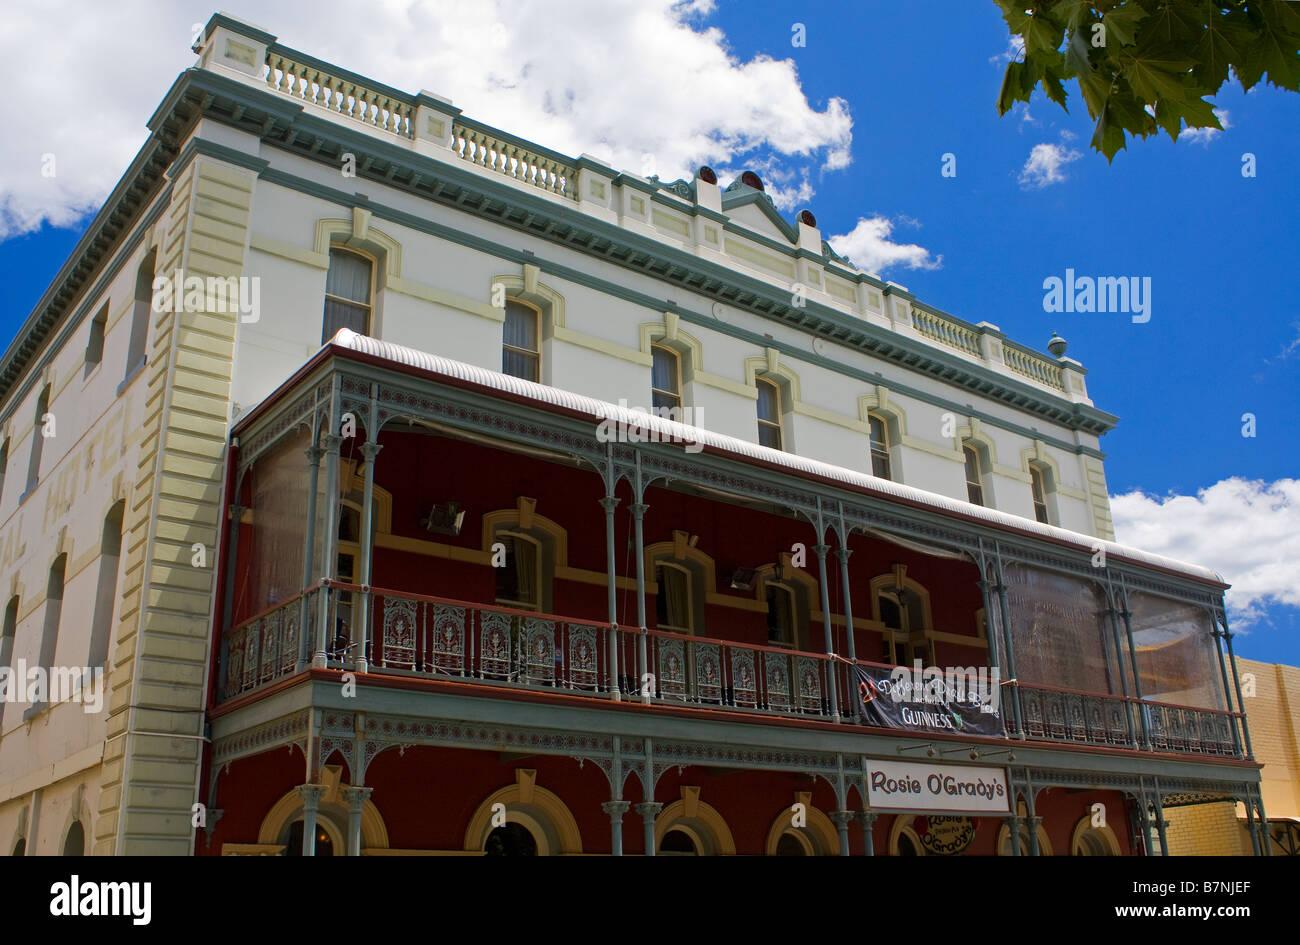 Rosie OGradys Pub Fremantle Perth Western Australia - Stock Image